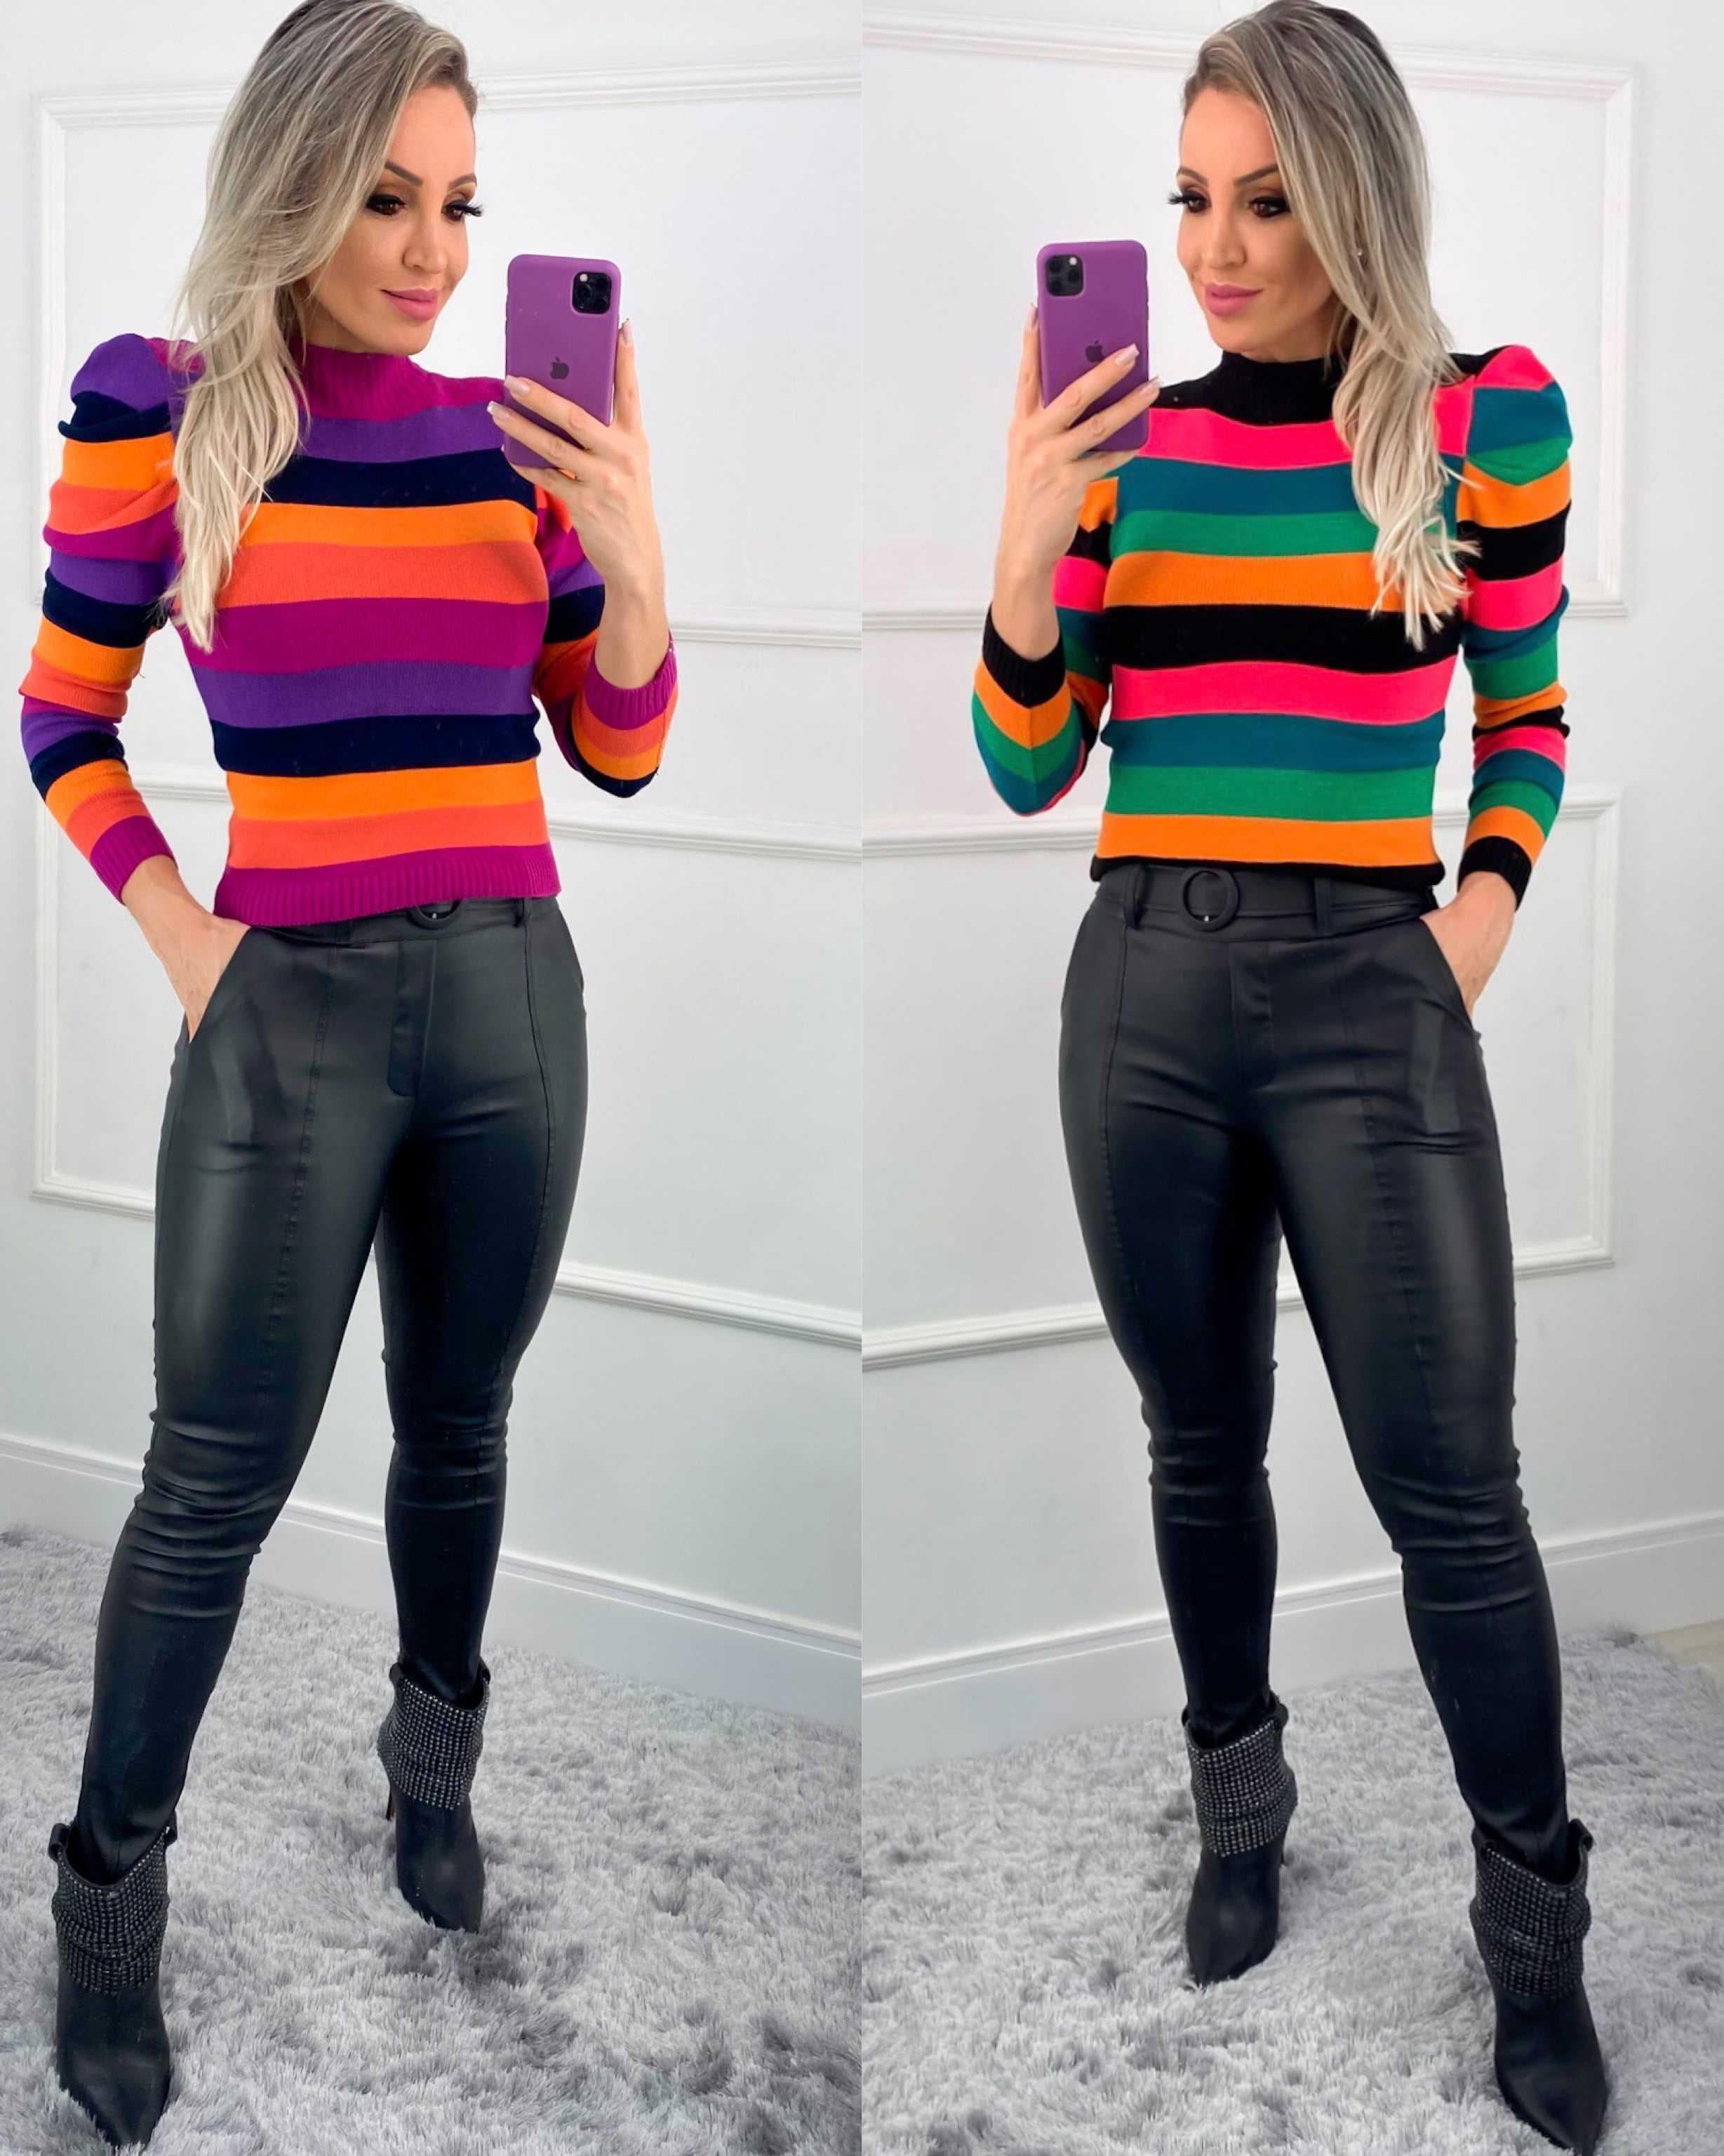 Strass Moda